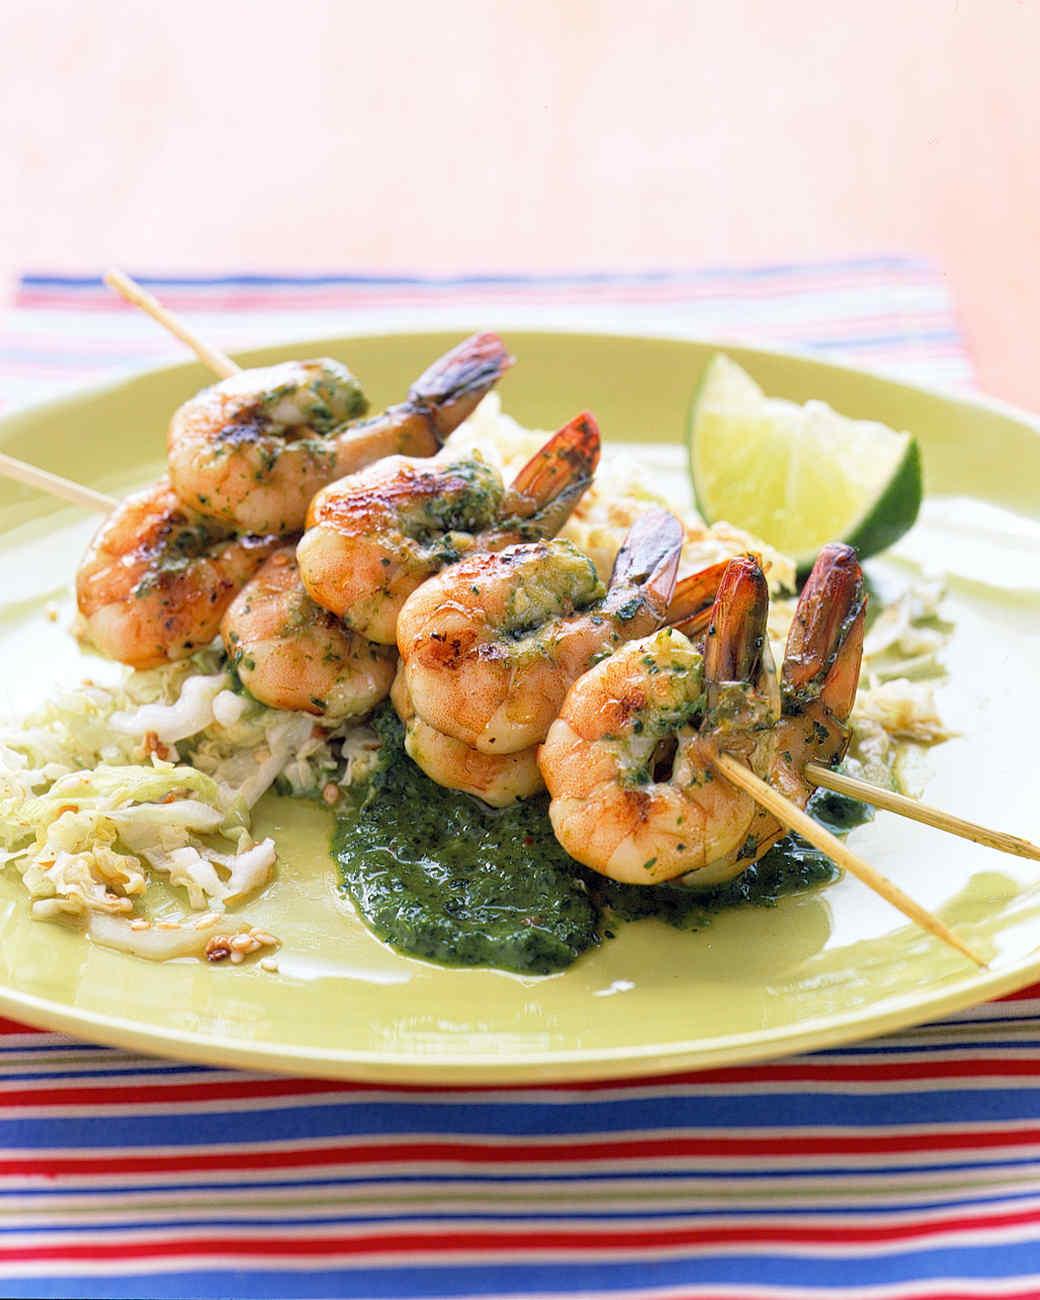 Cilantro-Grilled Shrimp with Sesame Cabbage